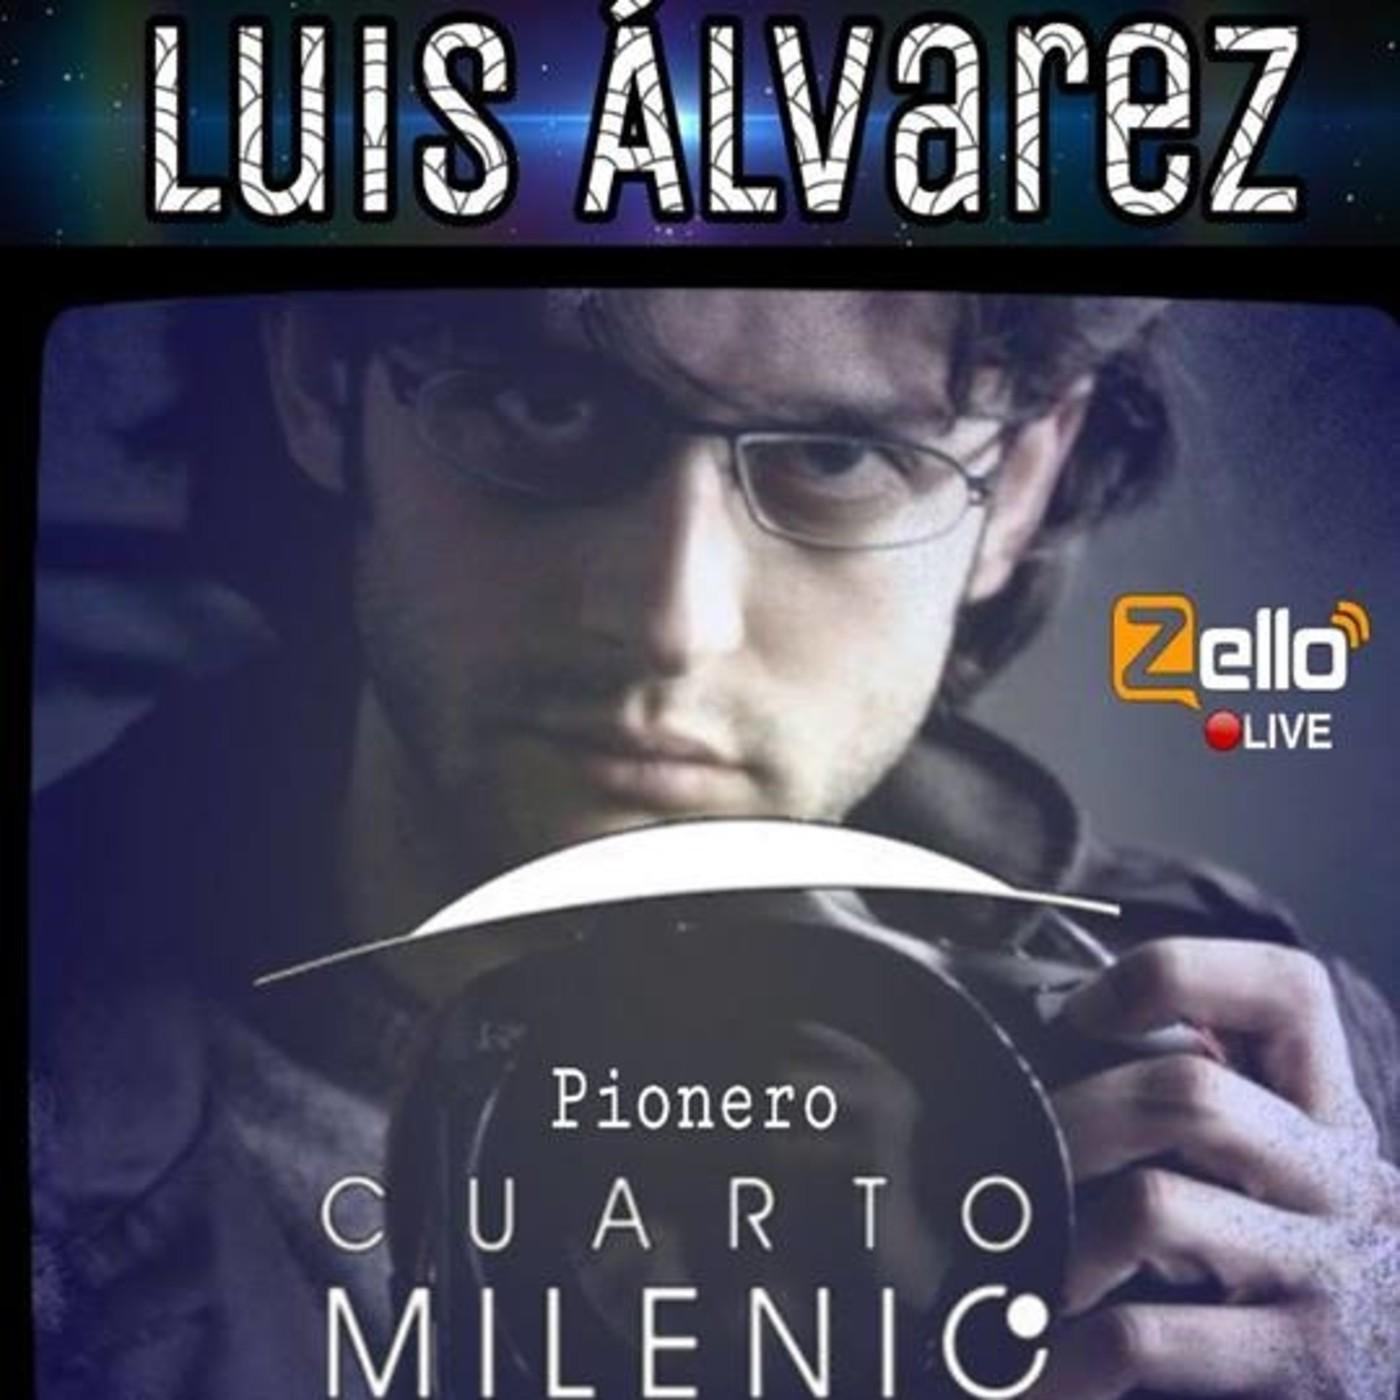 LUIS ALVAREZ\' EN Alerta OvNi 2012 en Podcast Alerta OvNi 2012 (Zello ...